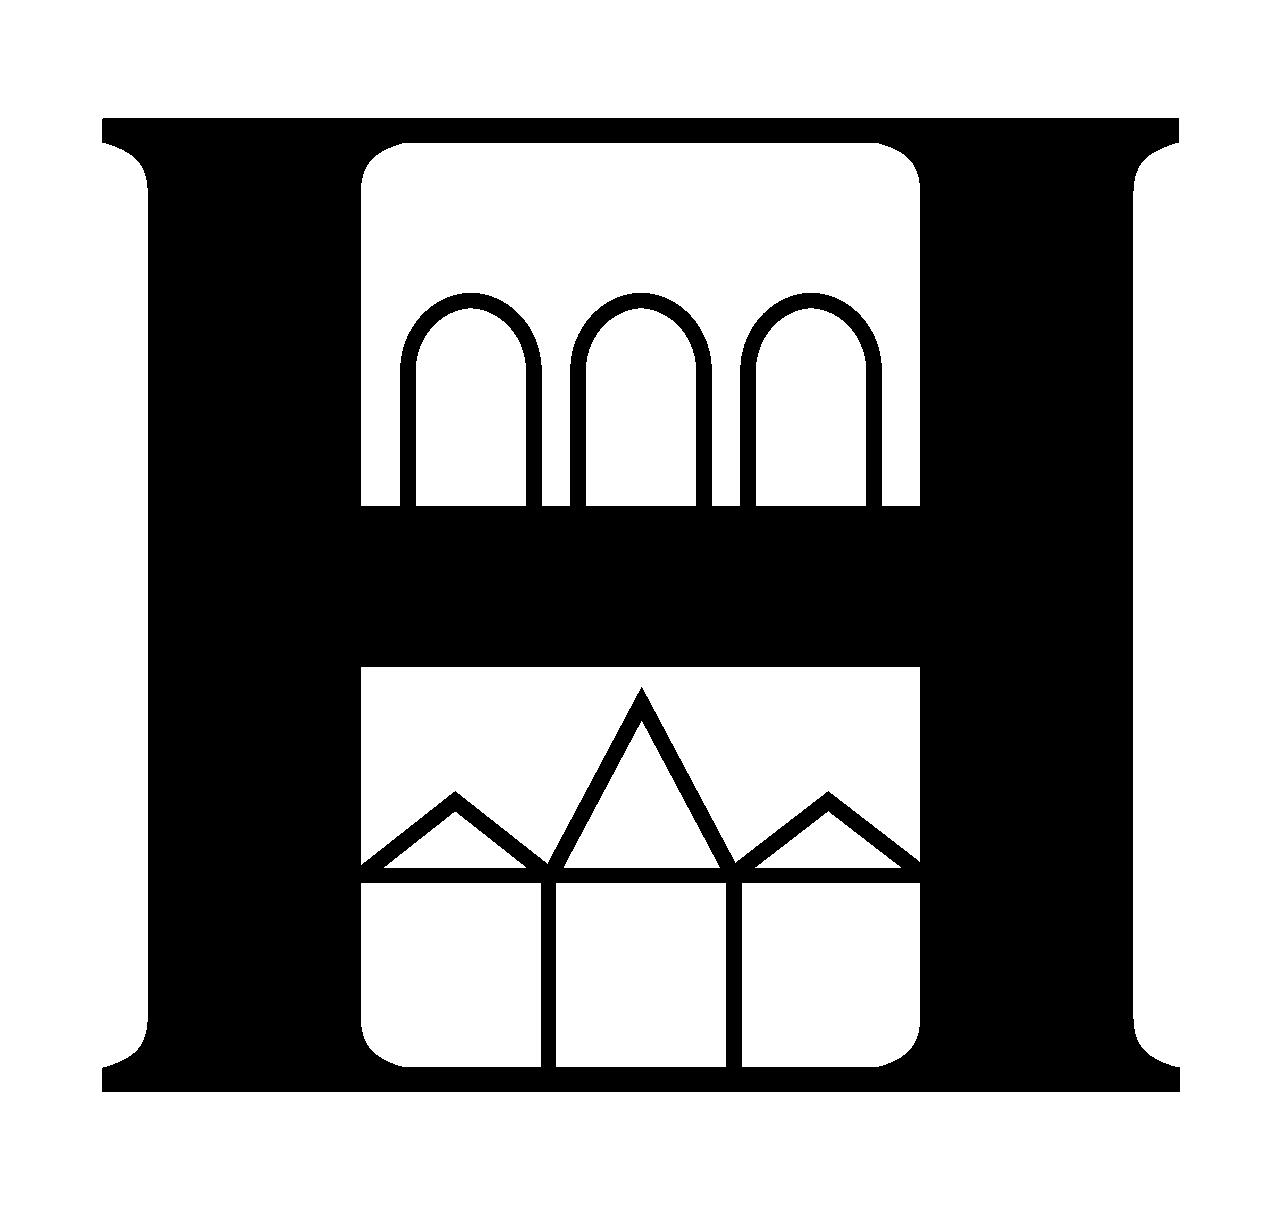 Gite de Charme Prieure Saint-Hippolyte Bourgogne Logo